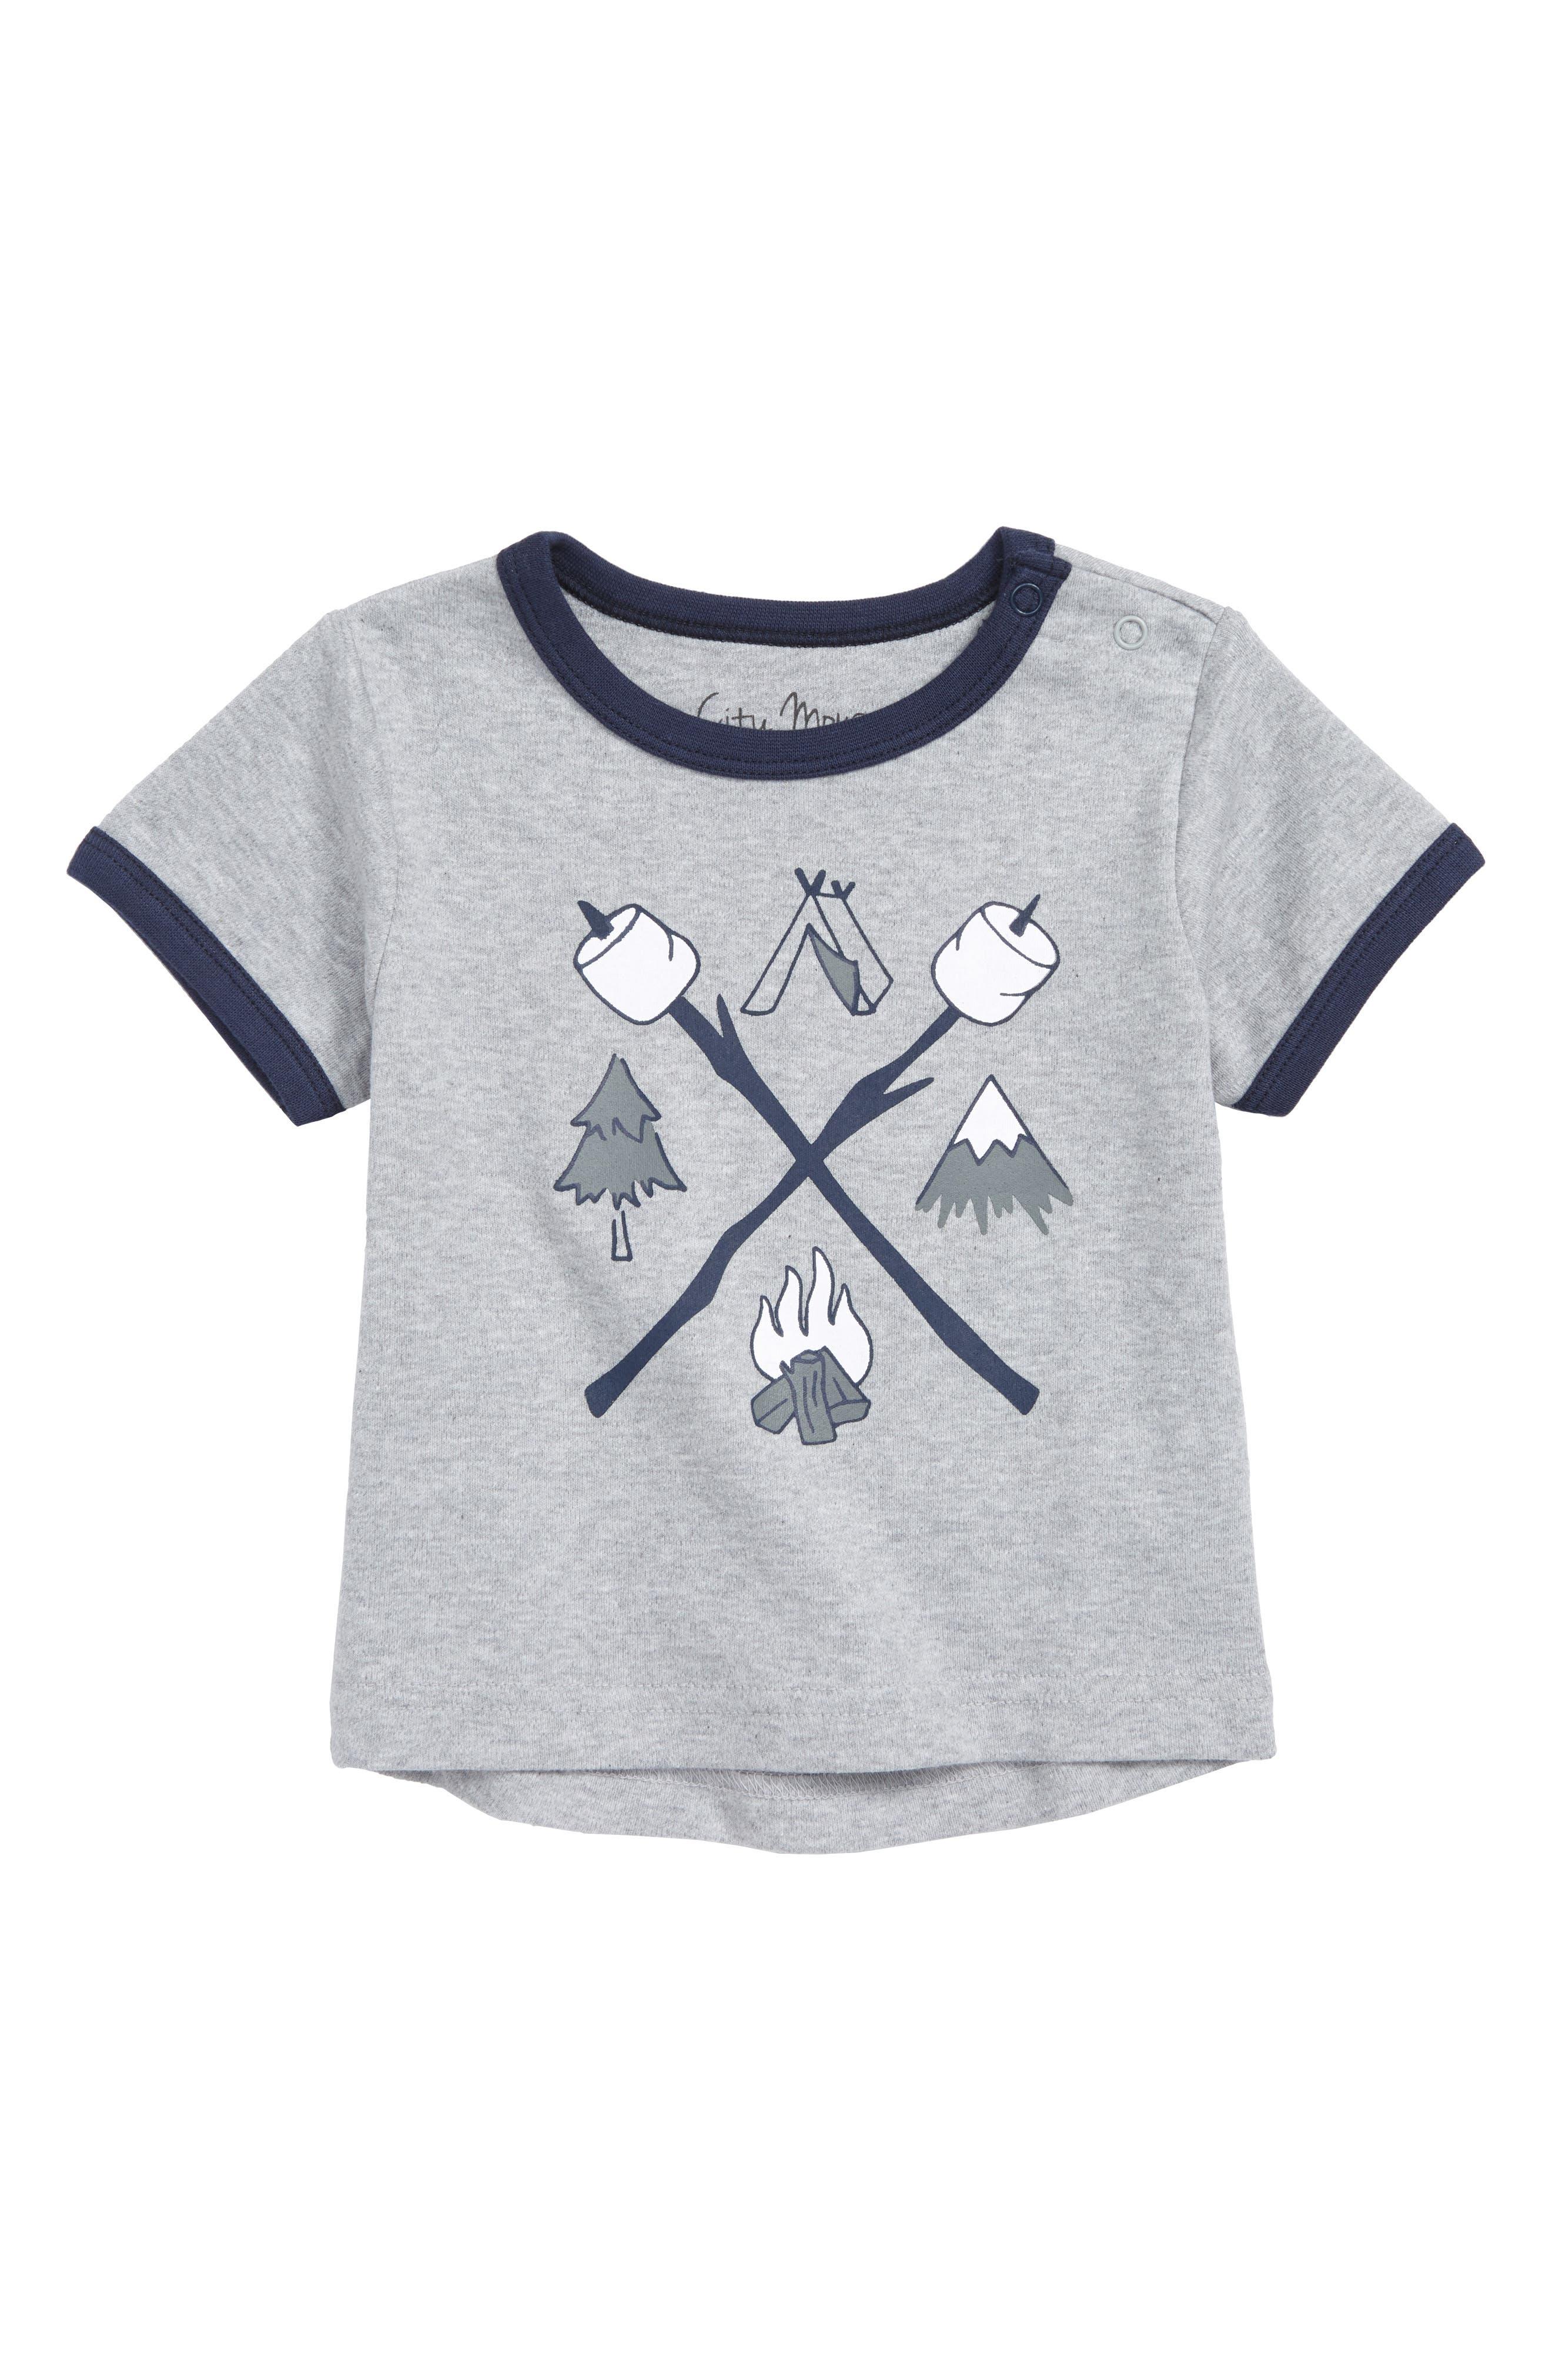 Camping Organic Cotton T-Shirt,                         Main,                         color,